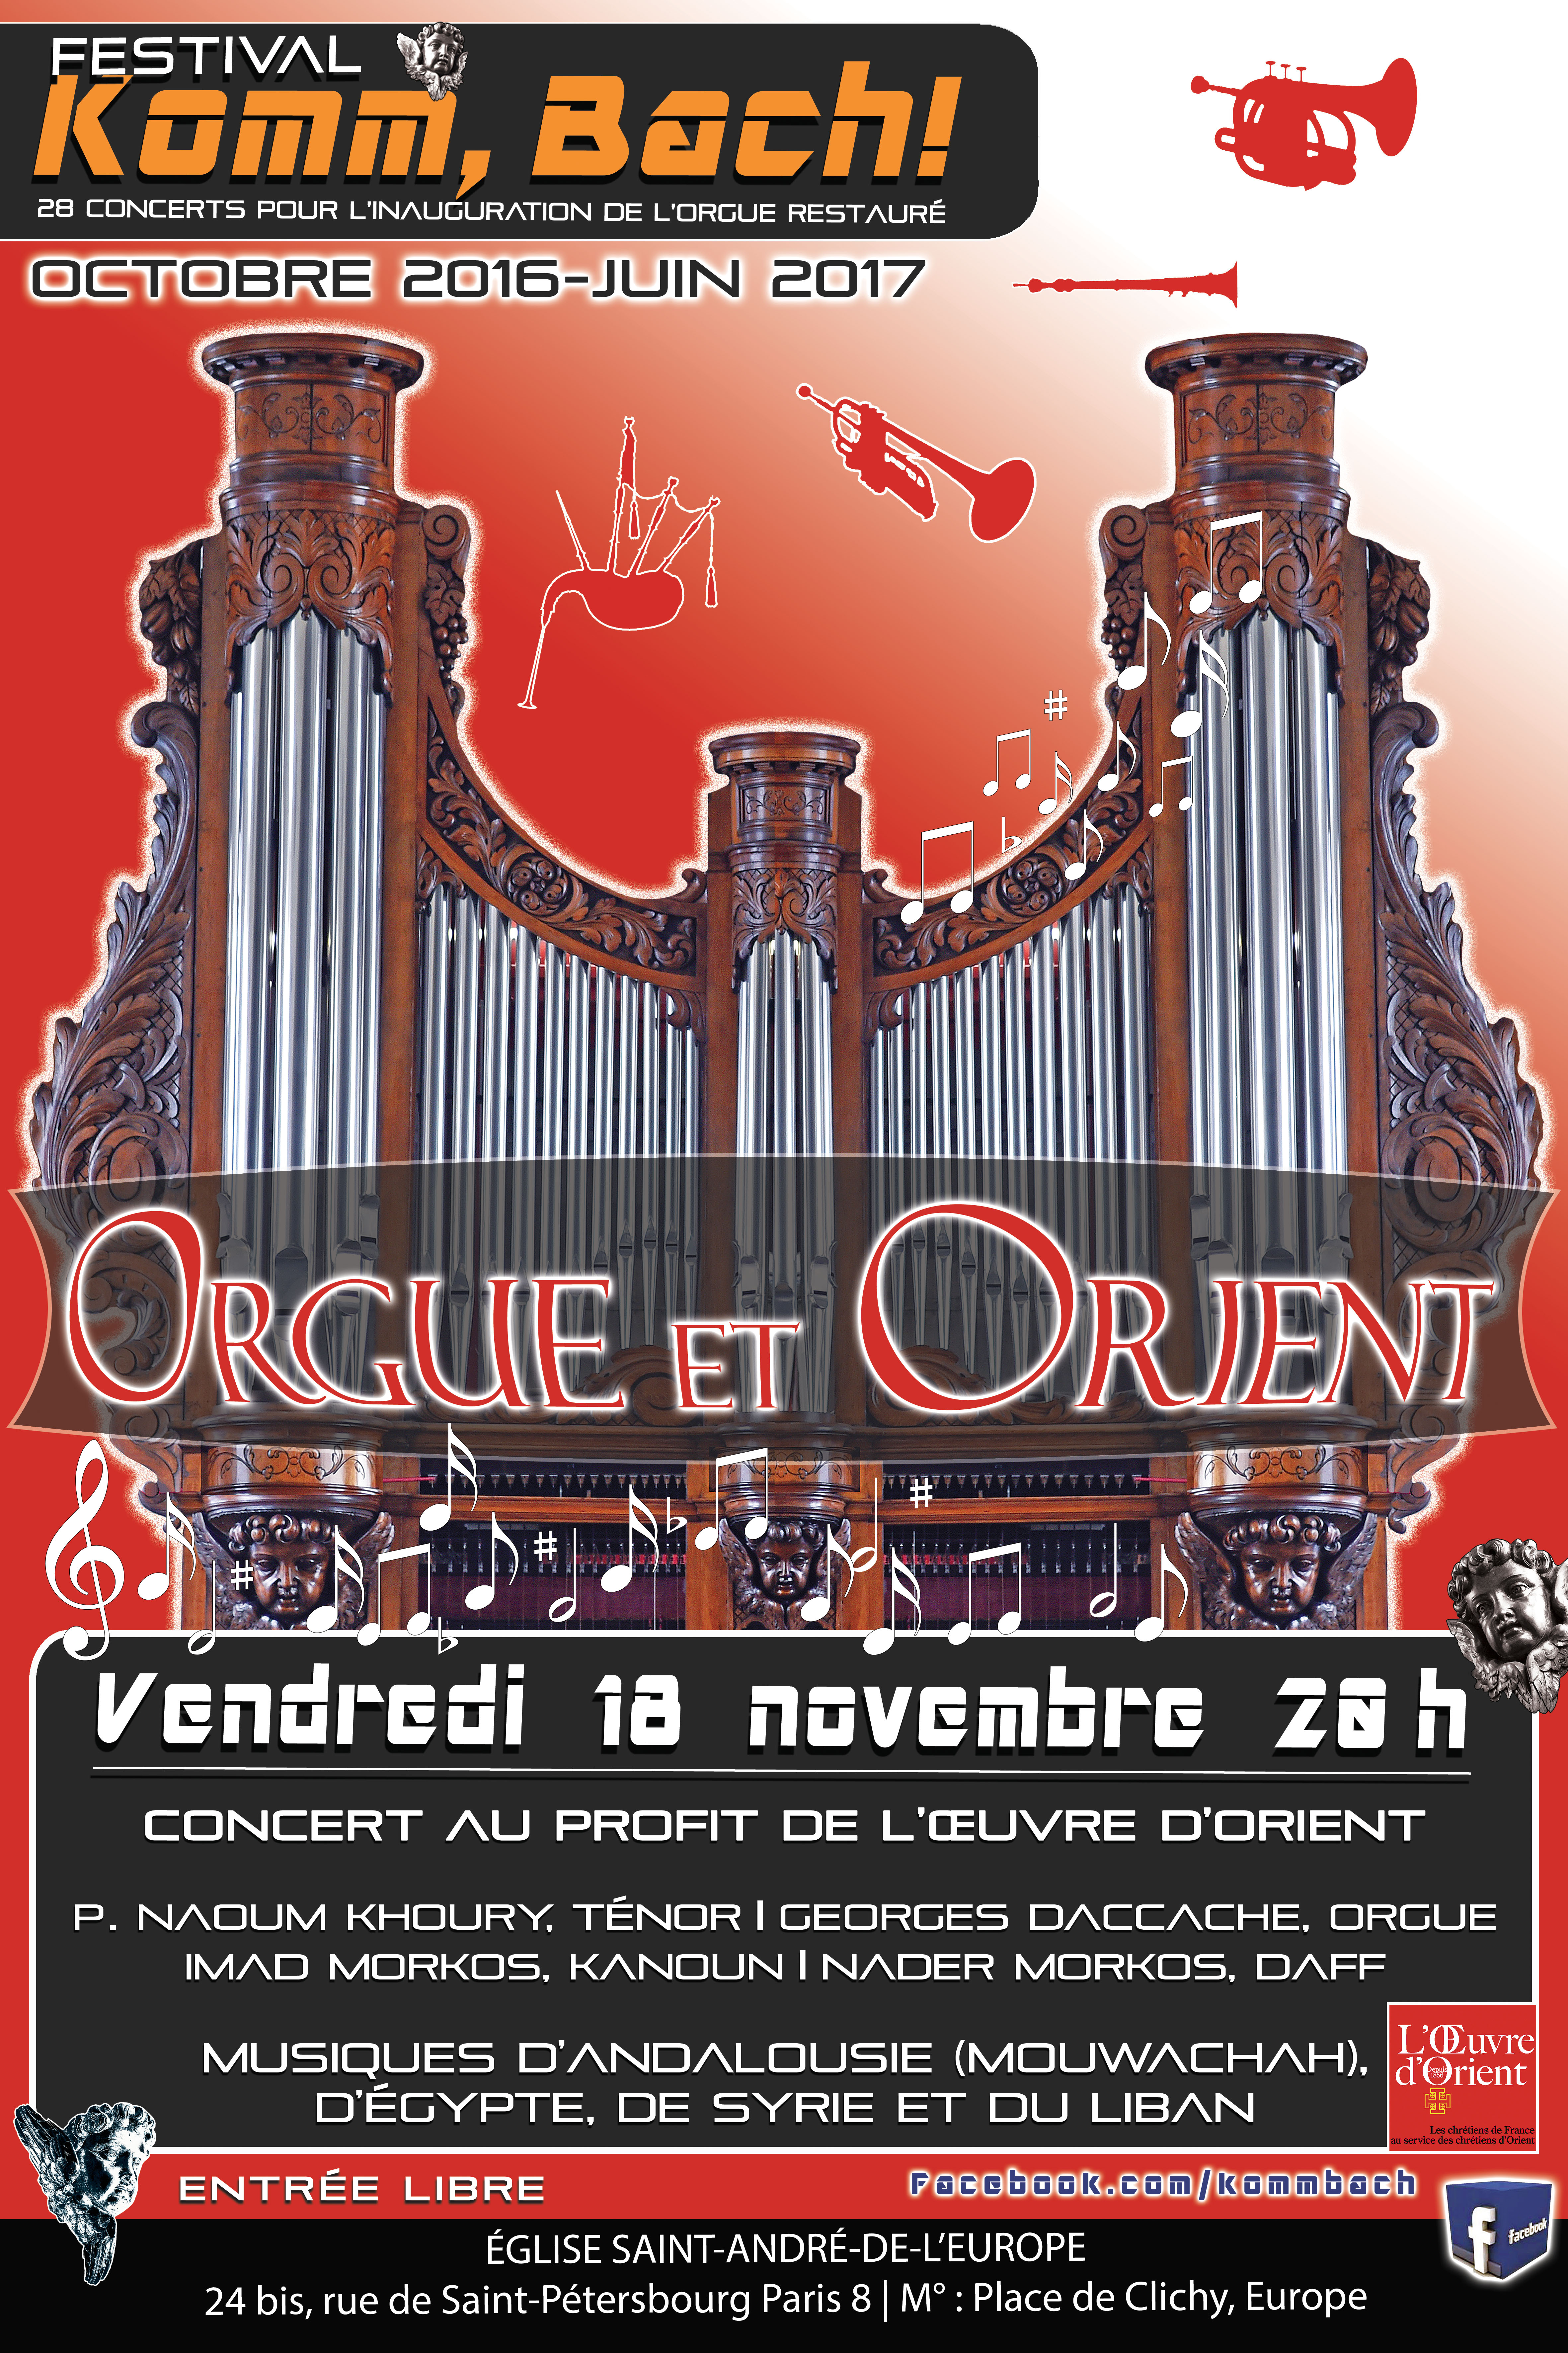 Affiche concert-03 - 18-novembre-v3